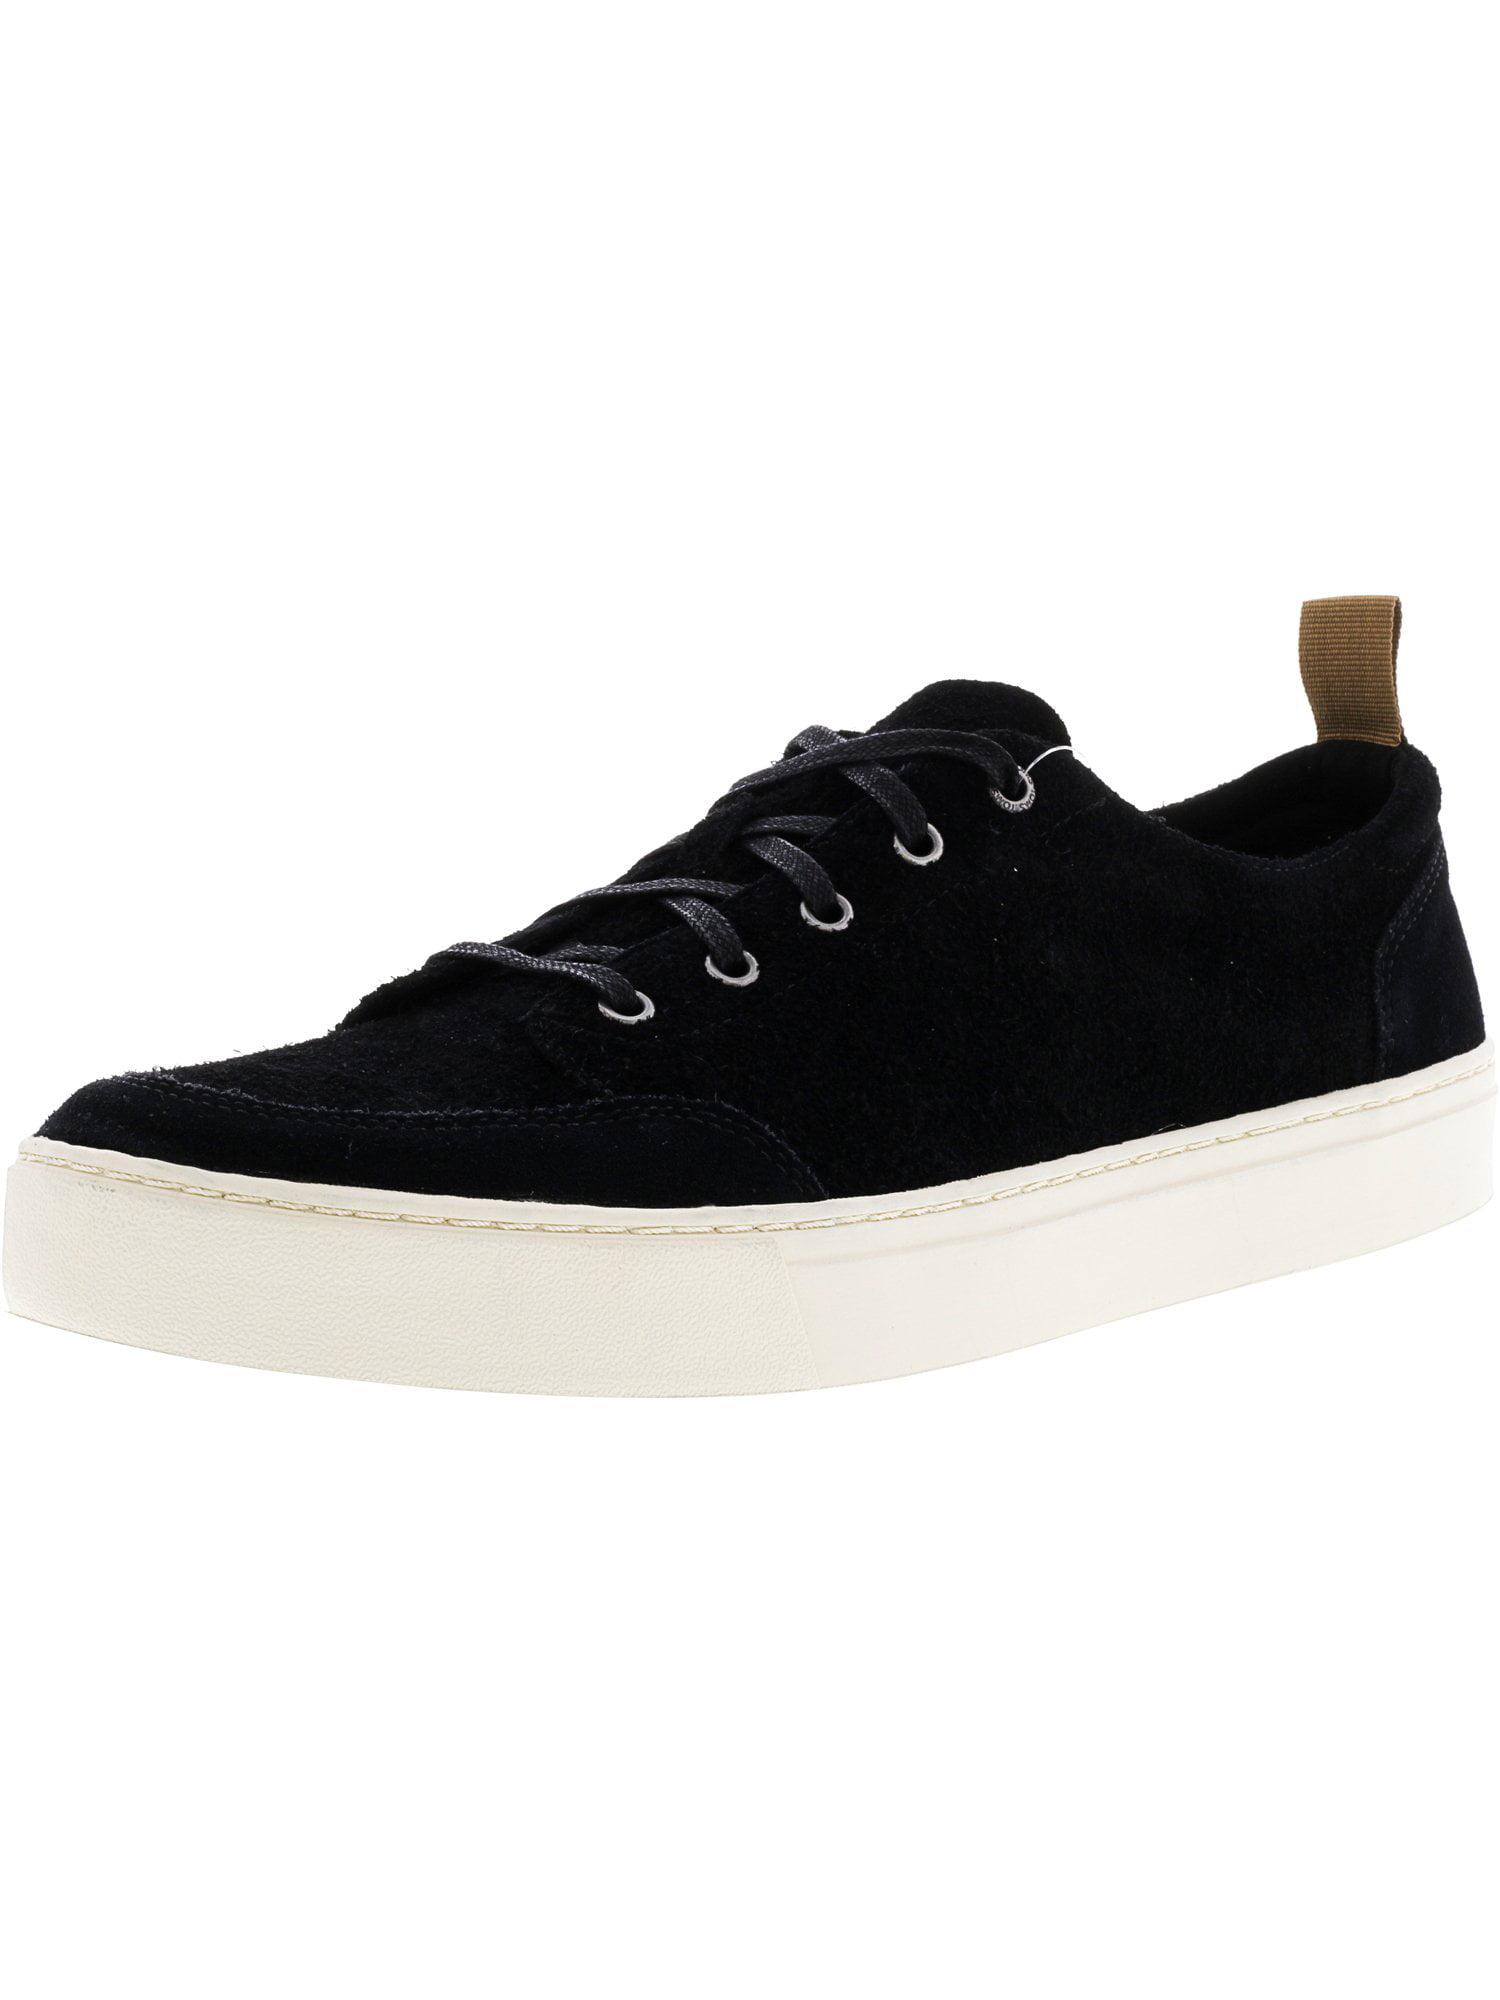 742ce019bf8 Toms Men s Landen Shaggy Suede Black Low Top Fashion Sneaker - 9.5M